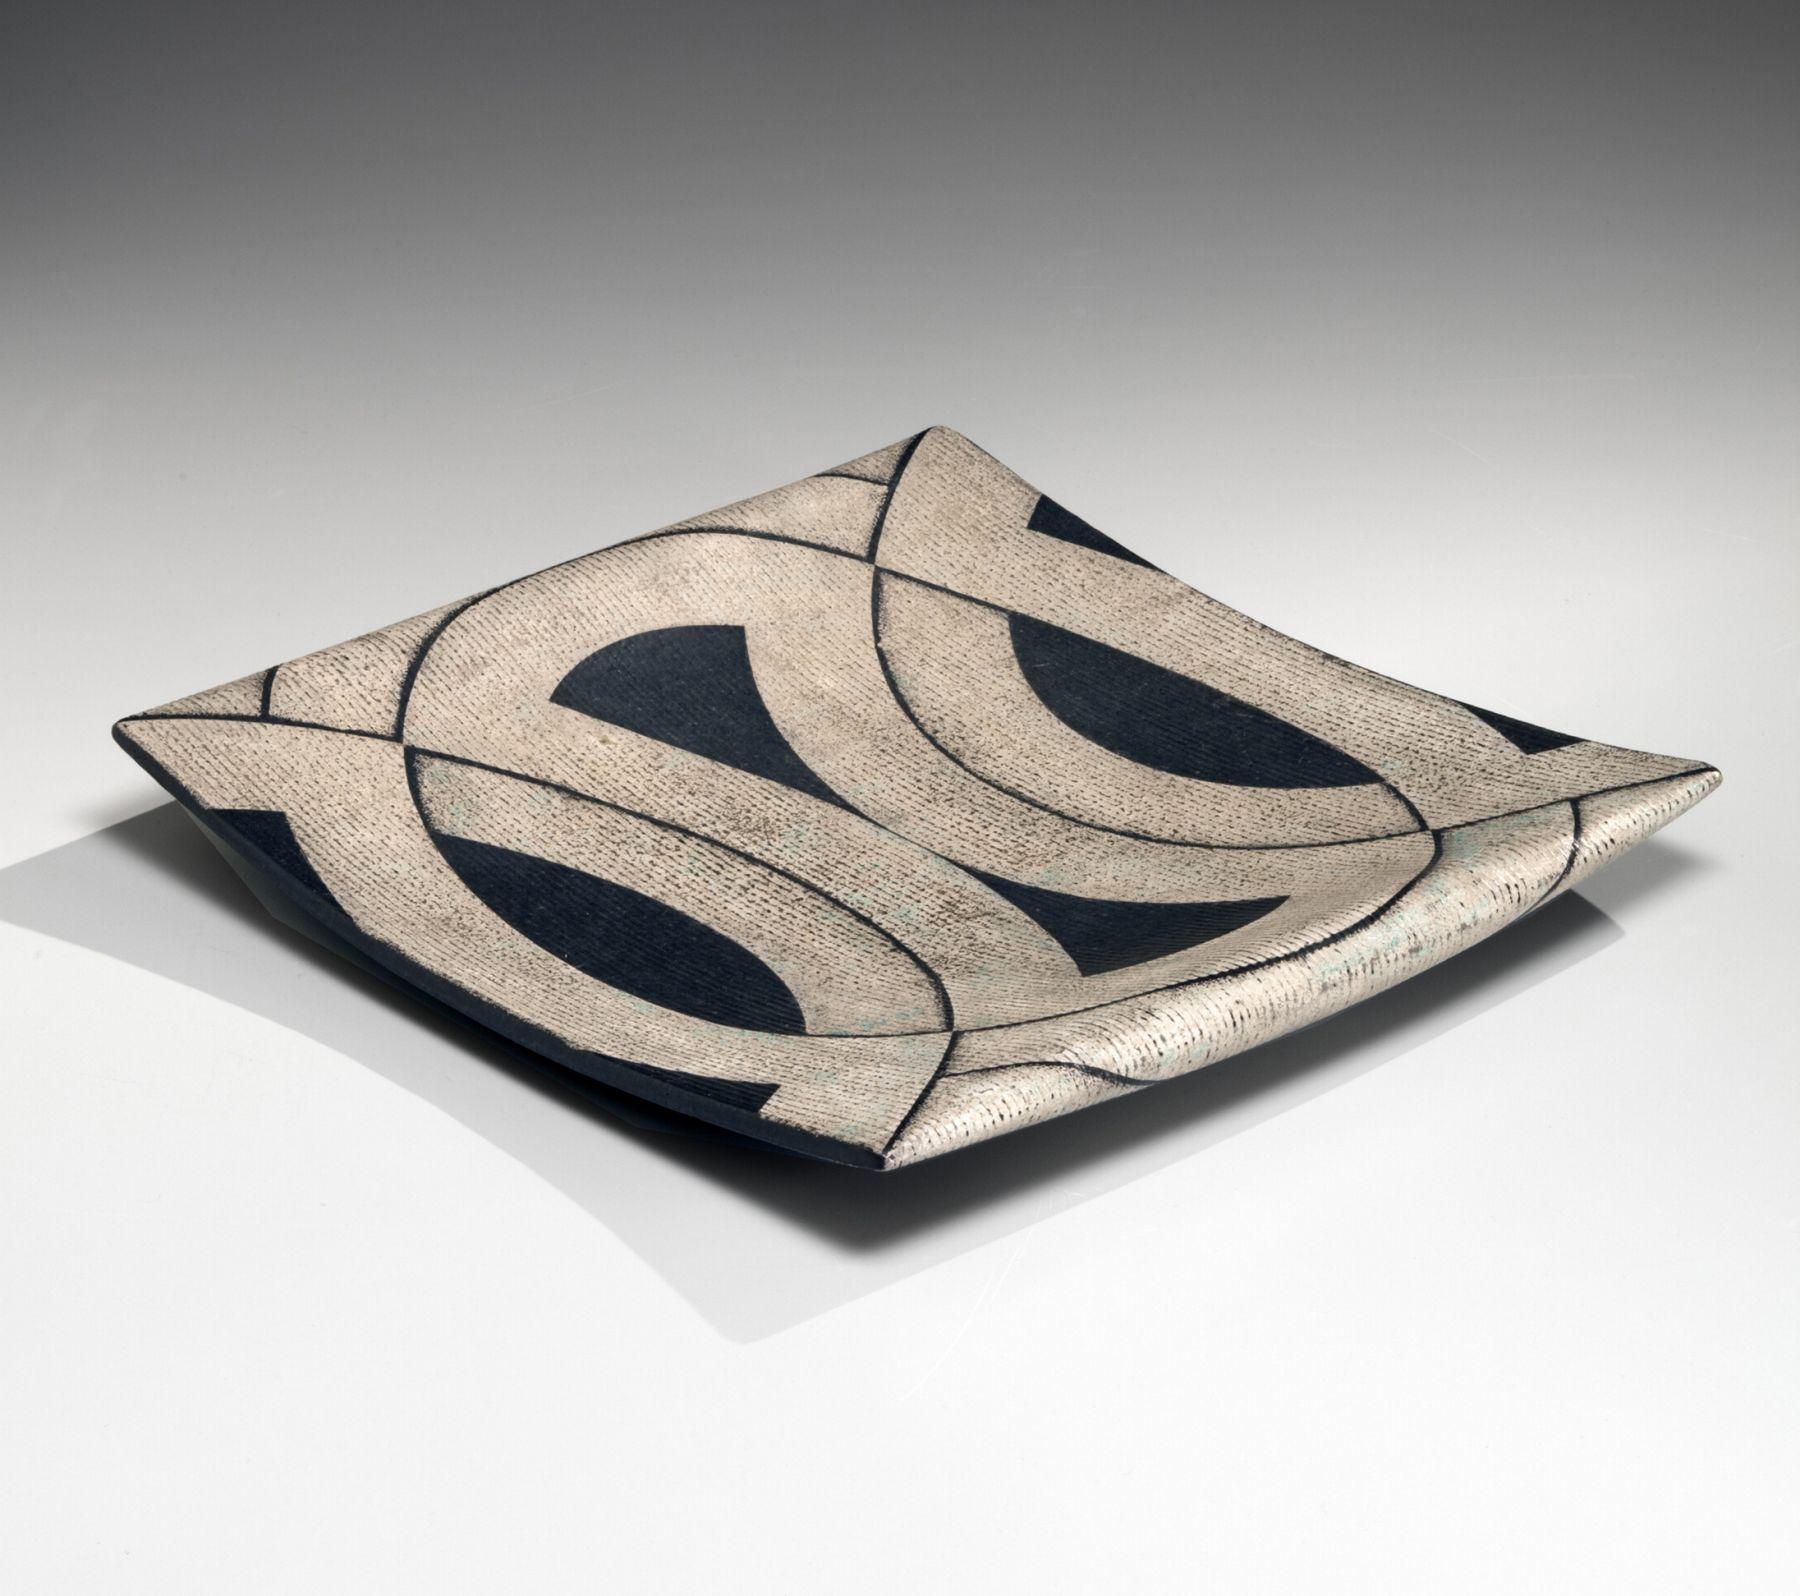 Platter with geometric patterning, ca. 1980